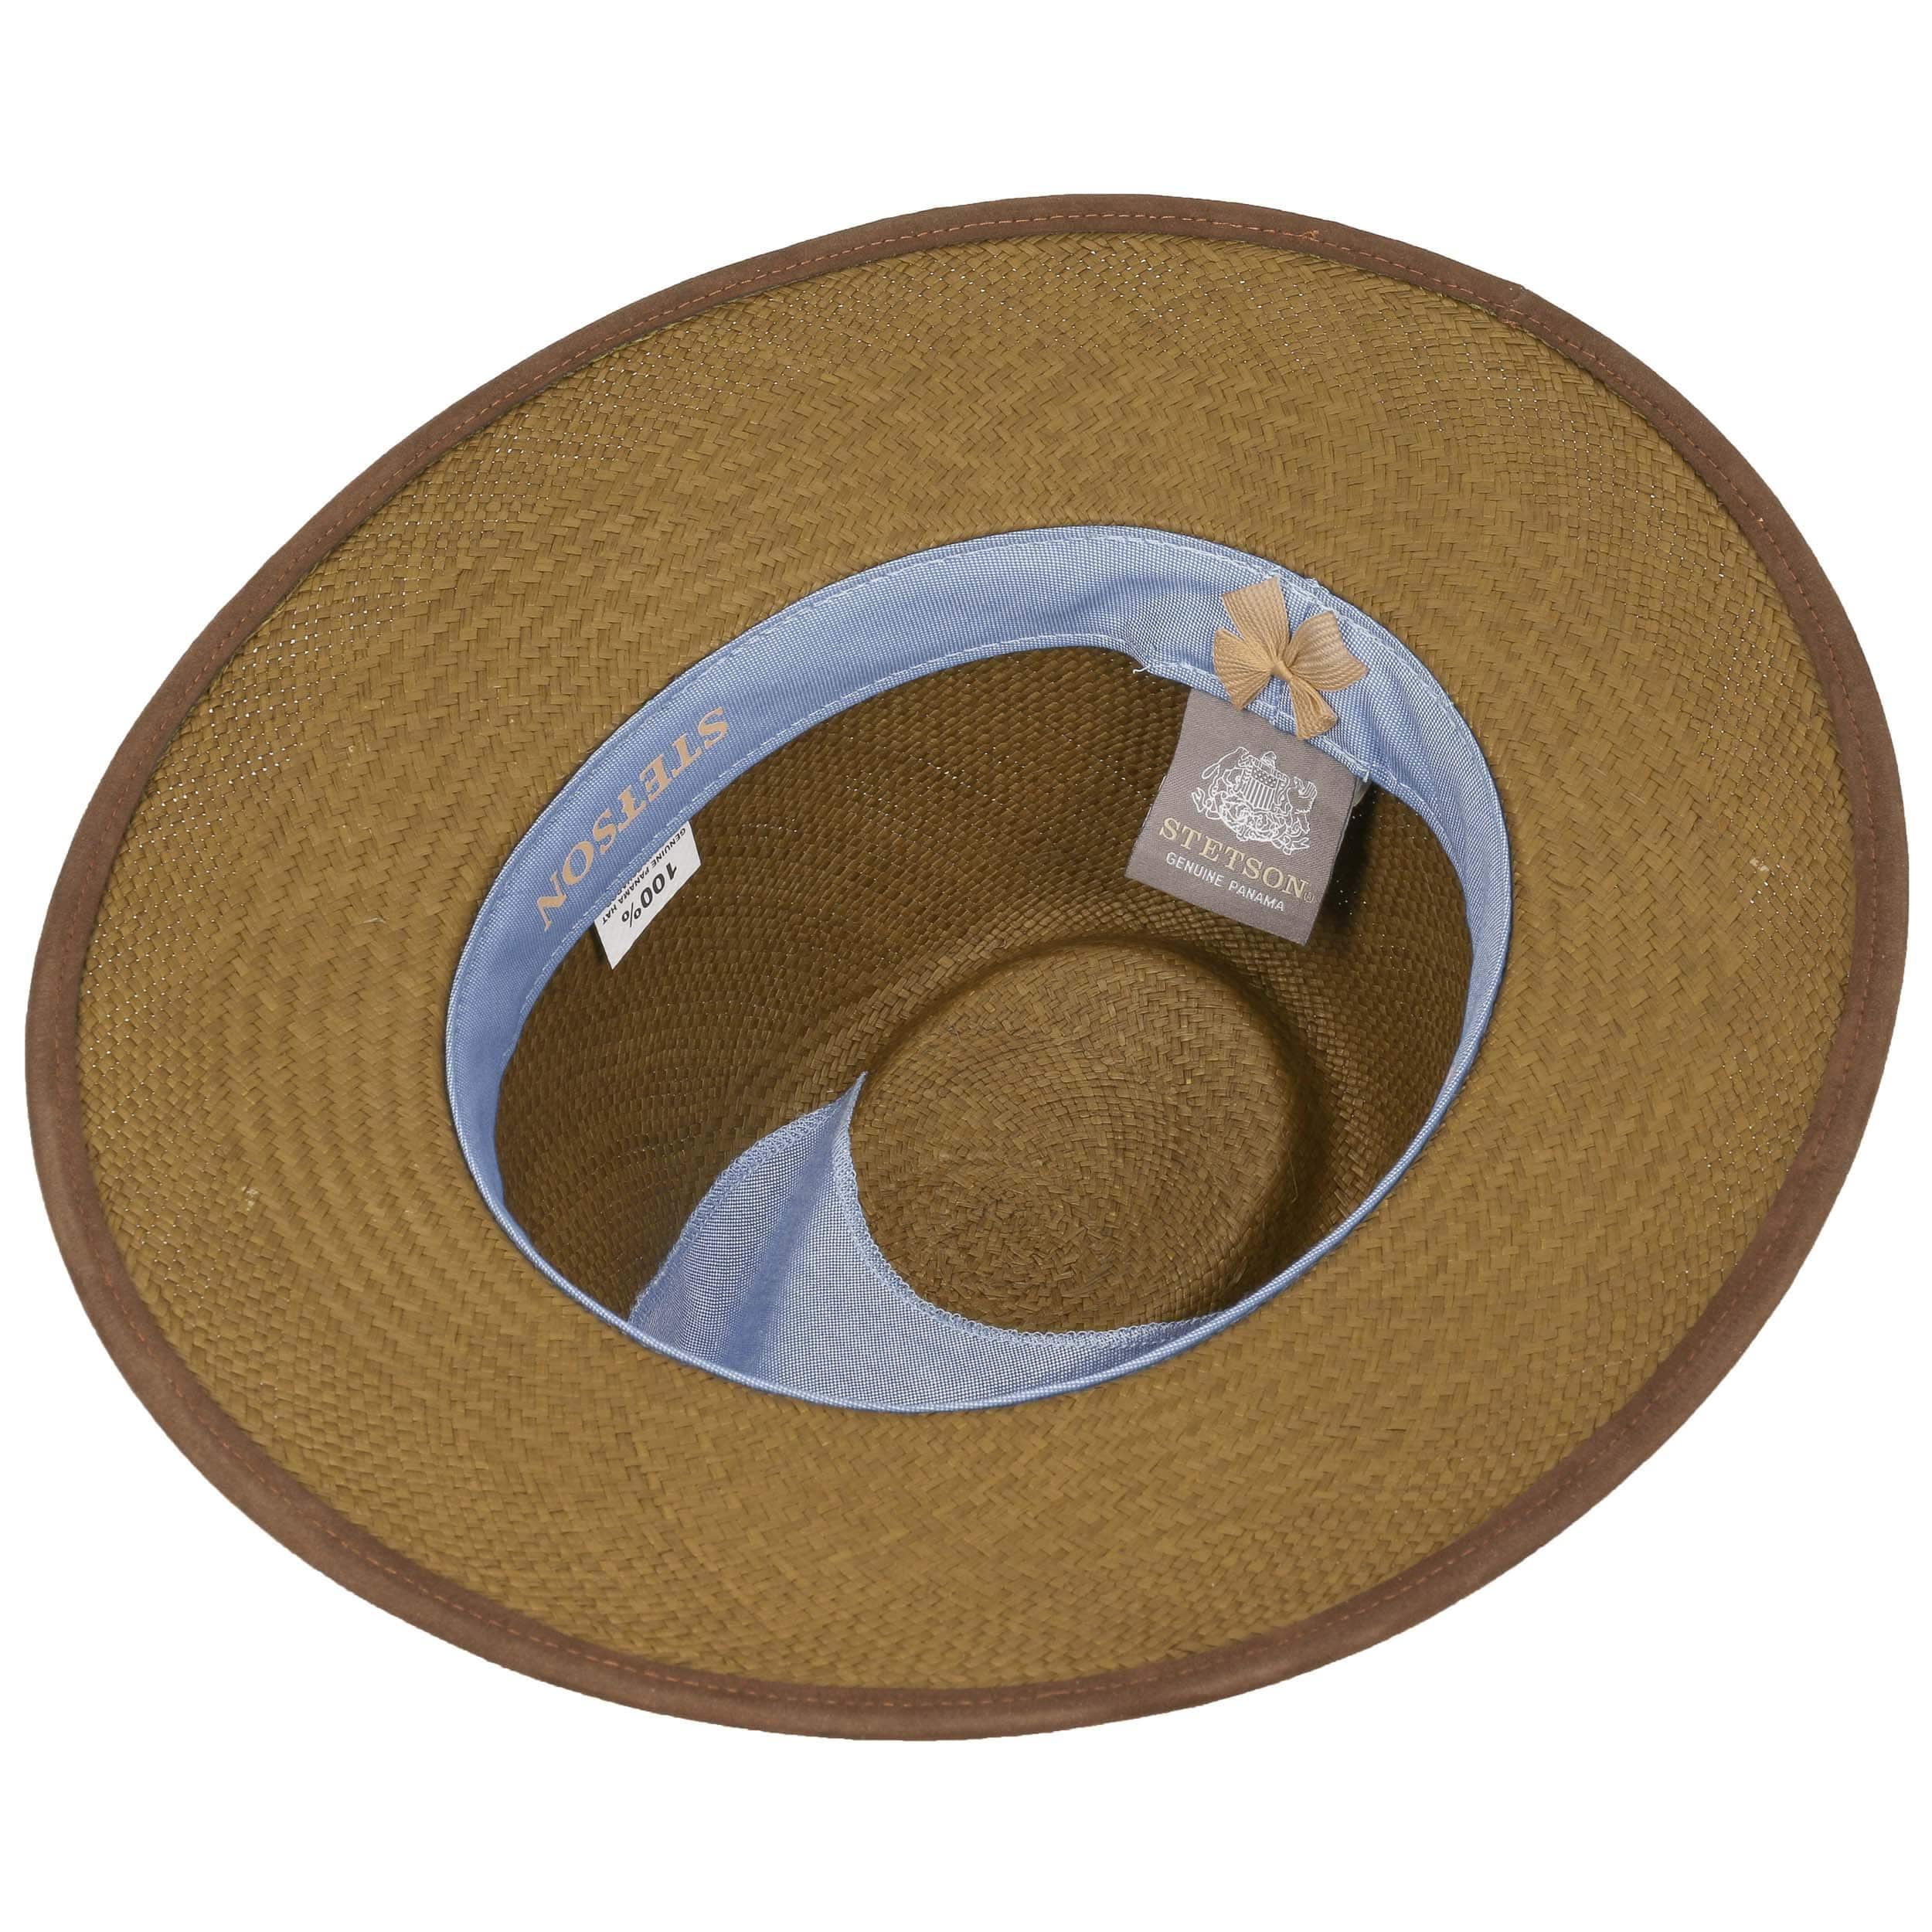 Sombrero Panama Braid by Stetson - Sombreros - sombreroshop.es 7cddbb26e81